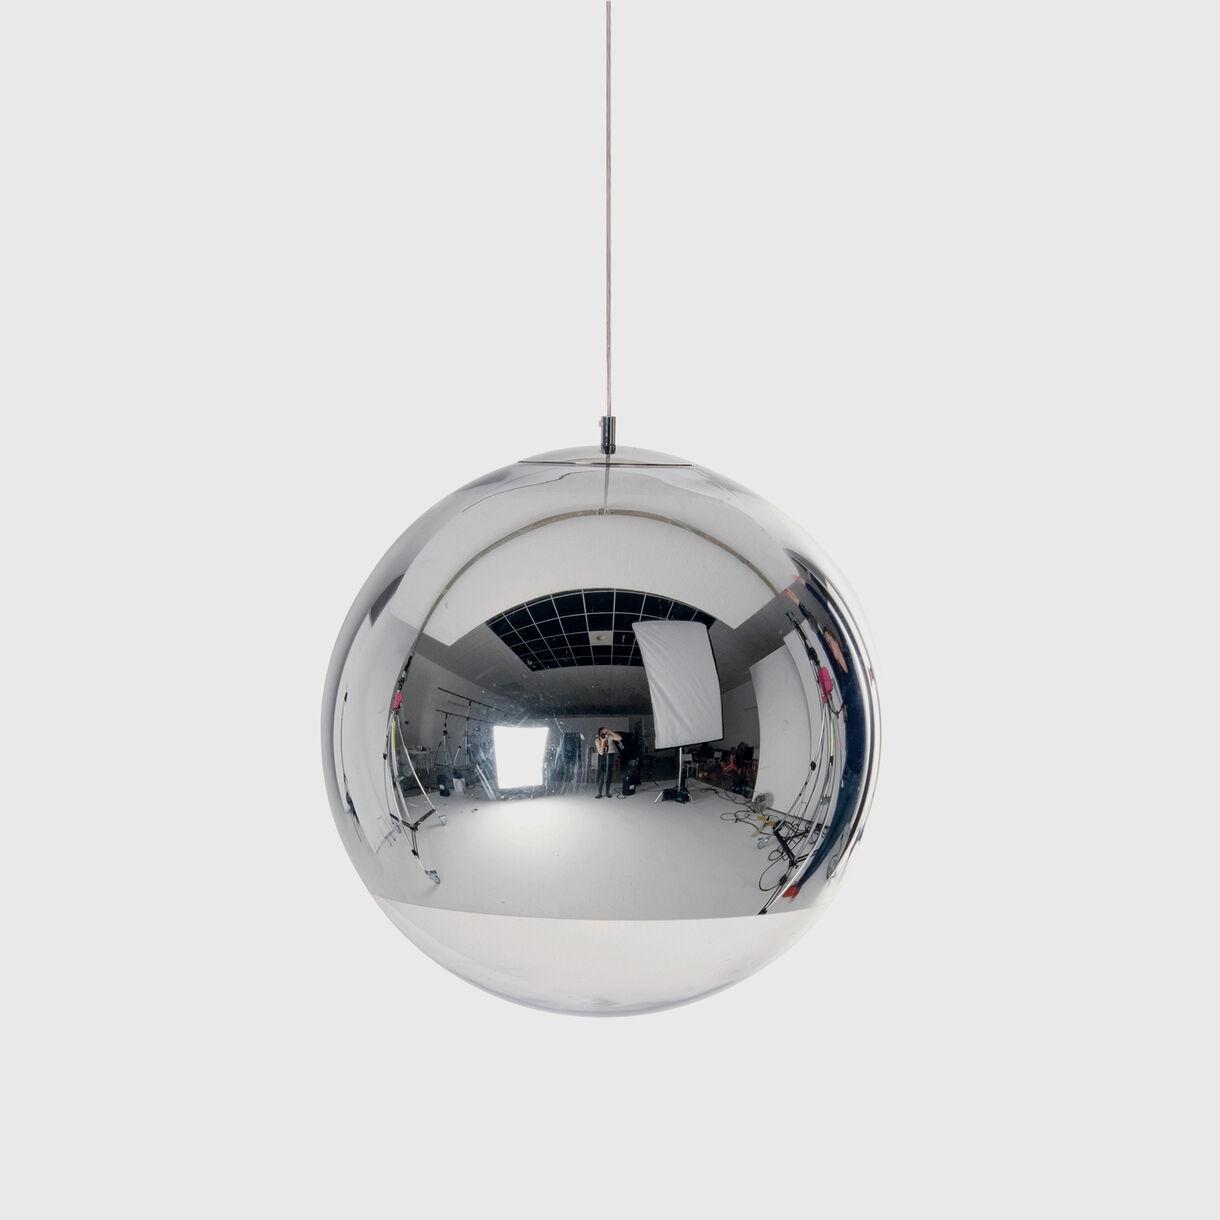 Mirror Ball Pendant 500mm, Chrome